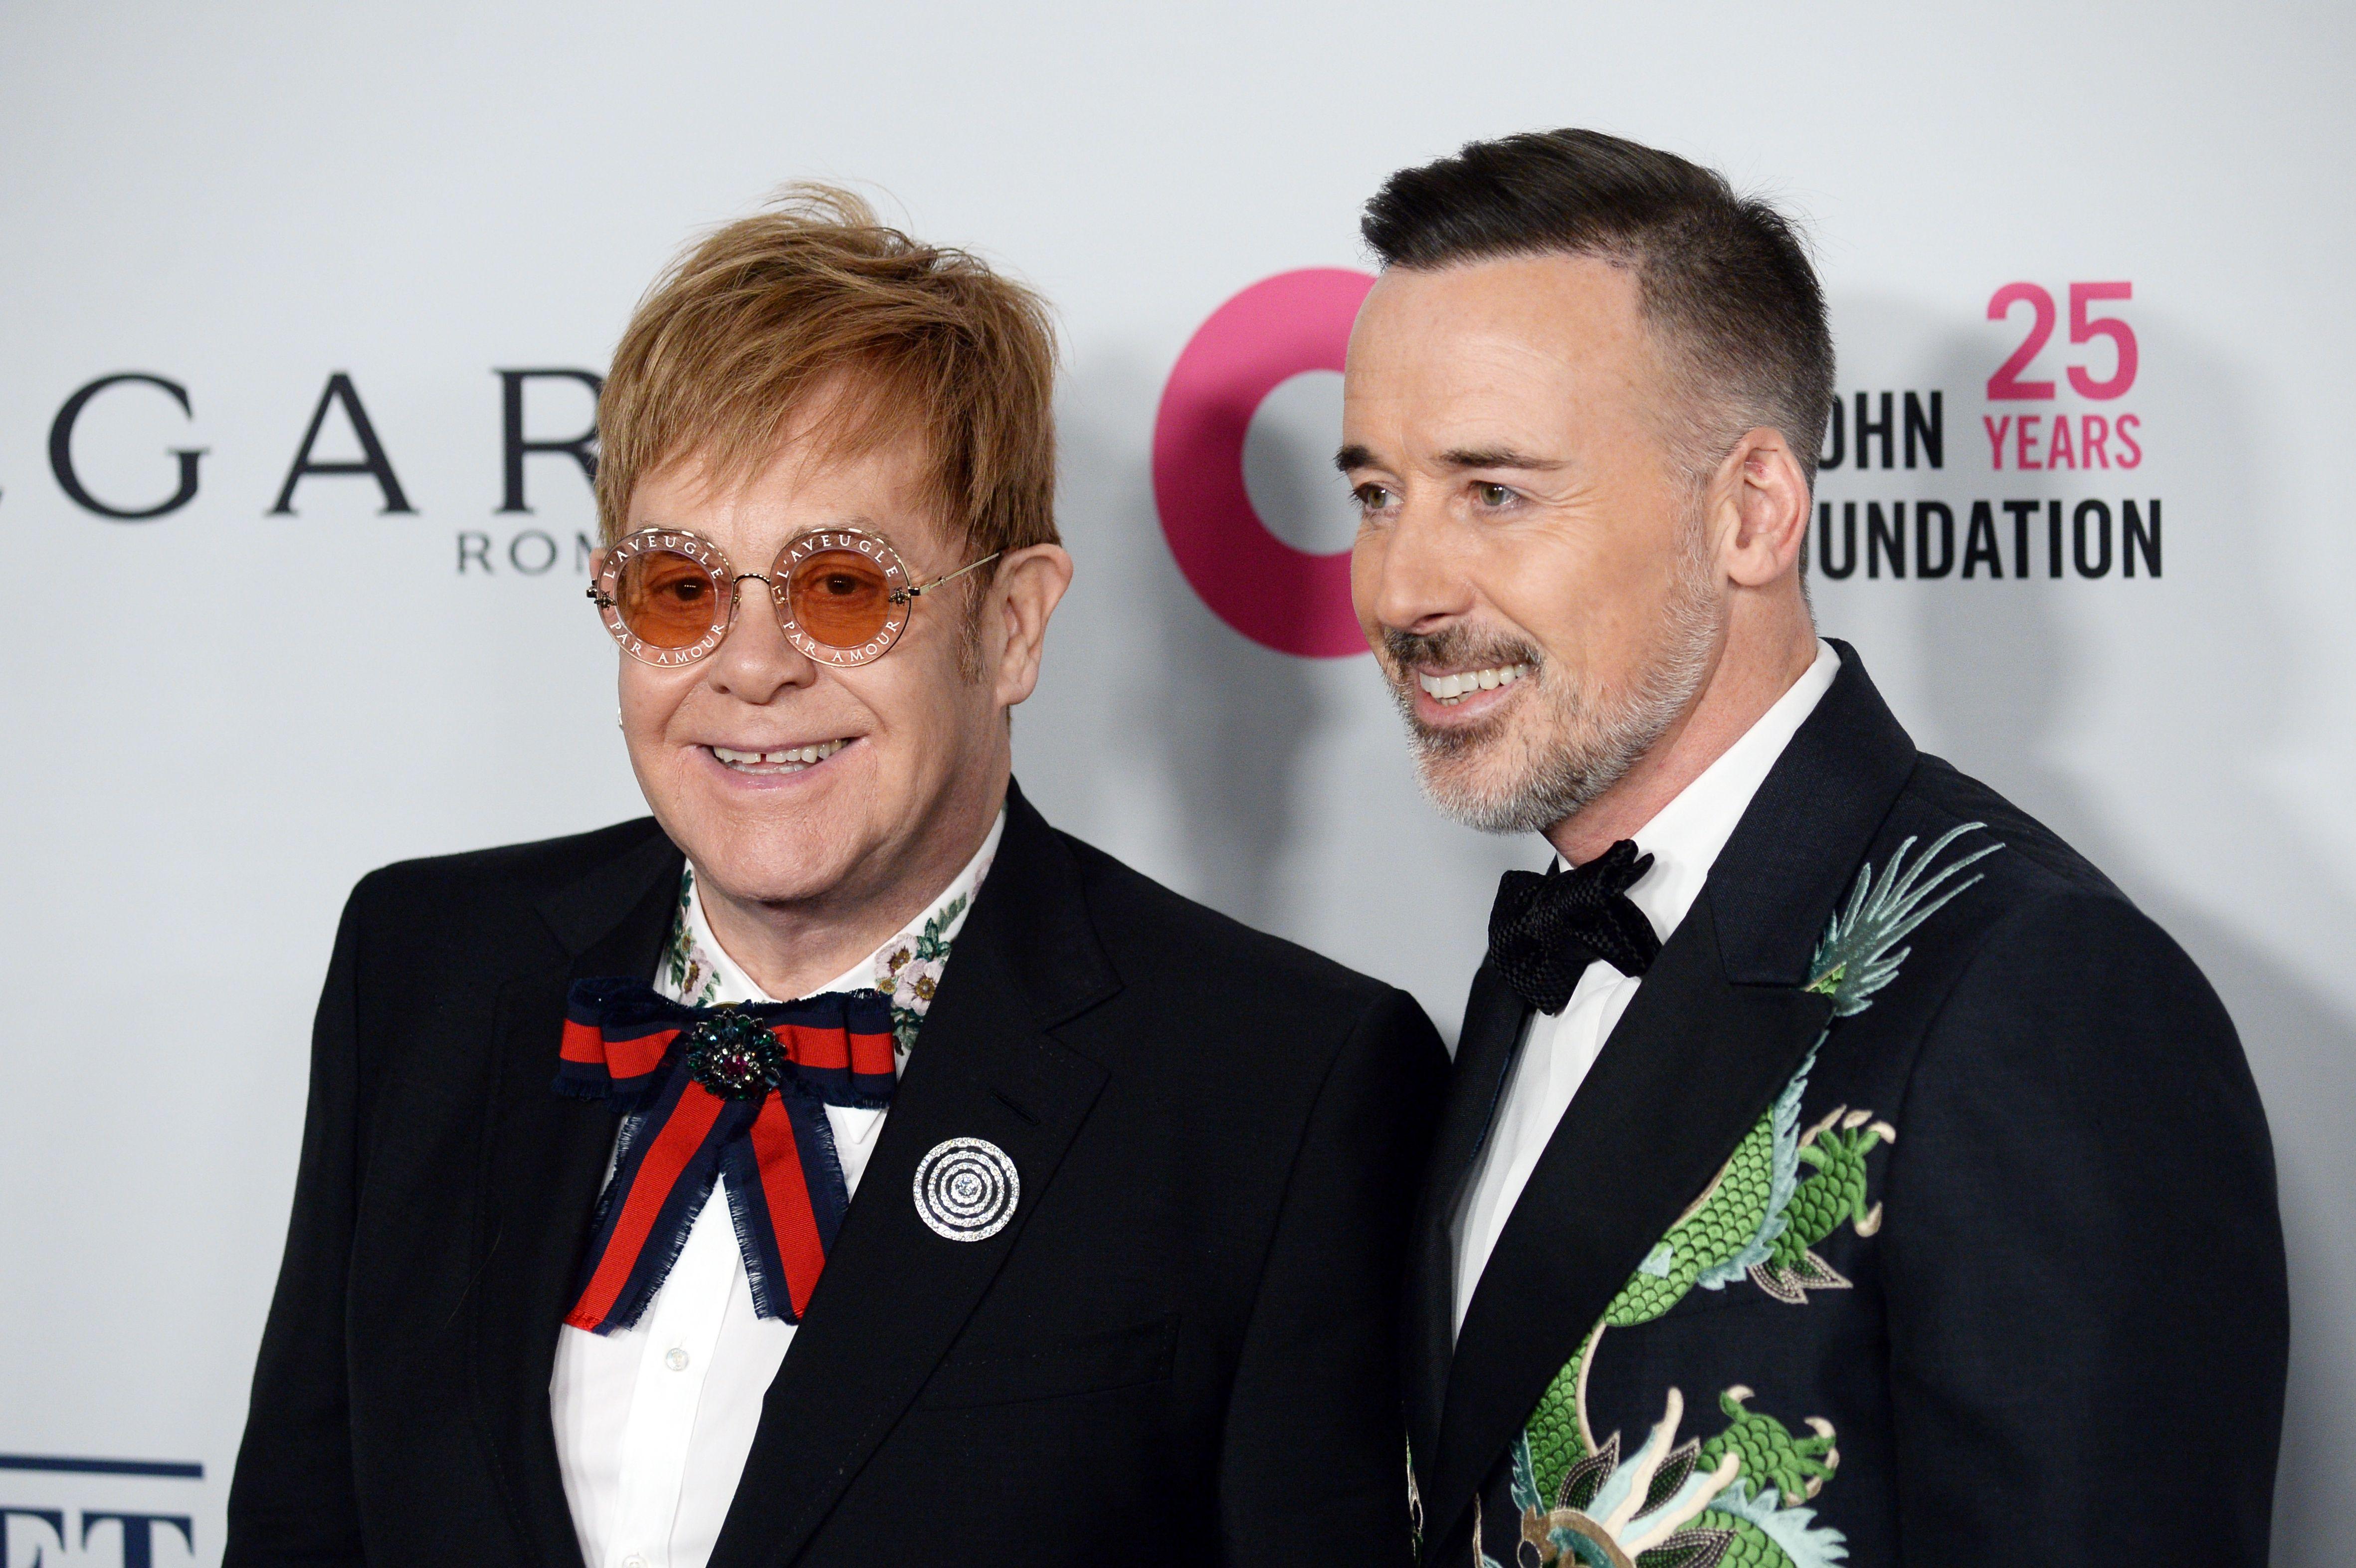 Sir Elton John, David FurnishElton John Aids Foundation Fall Gala, Arrivals, New York, USA - 07 Nov 2017